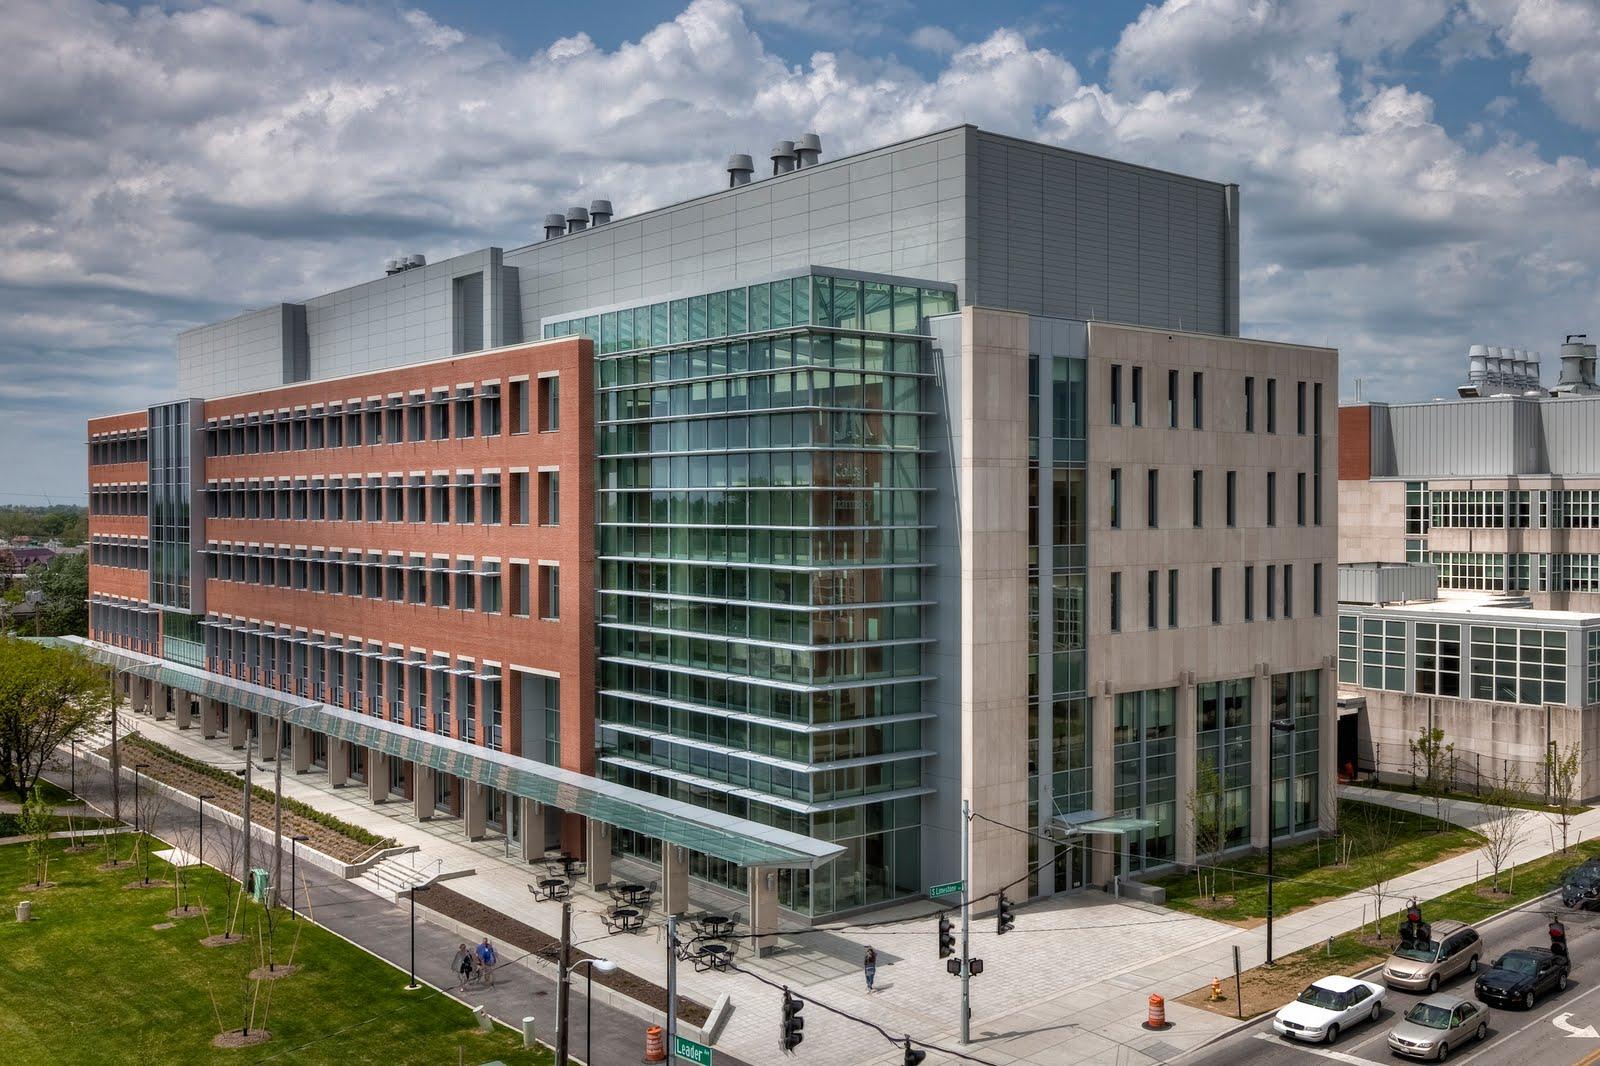 College of Pharmacy Exterior 1.jpg